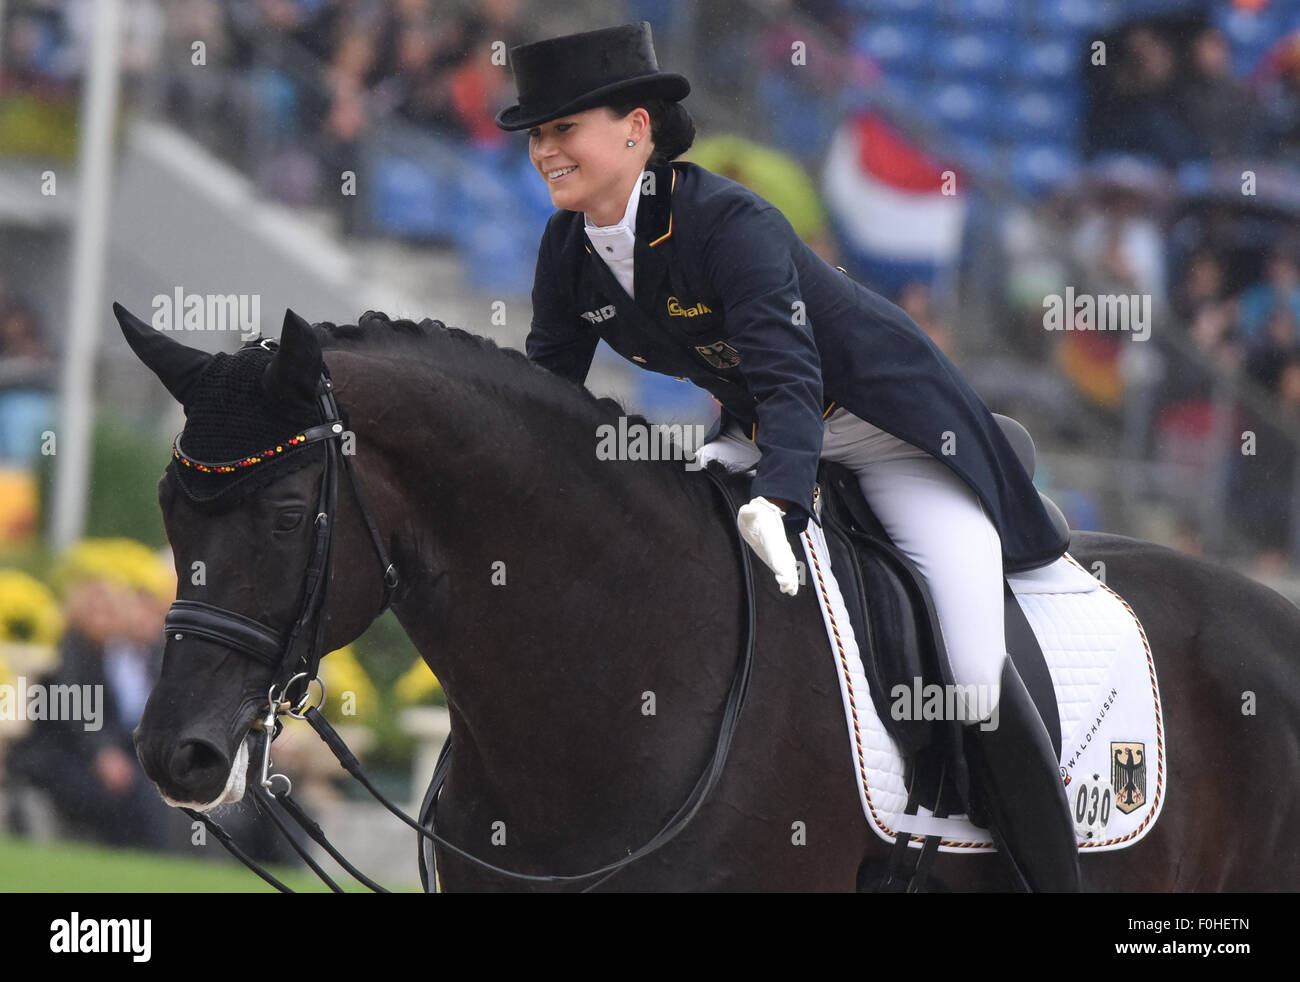 Kristina Broering Sprehe Of Germany Gestures On Her Horse Desperados Stock Photo Alamy